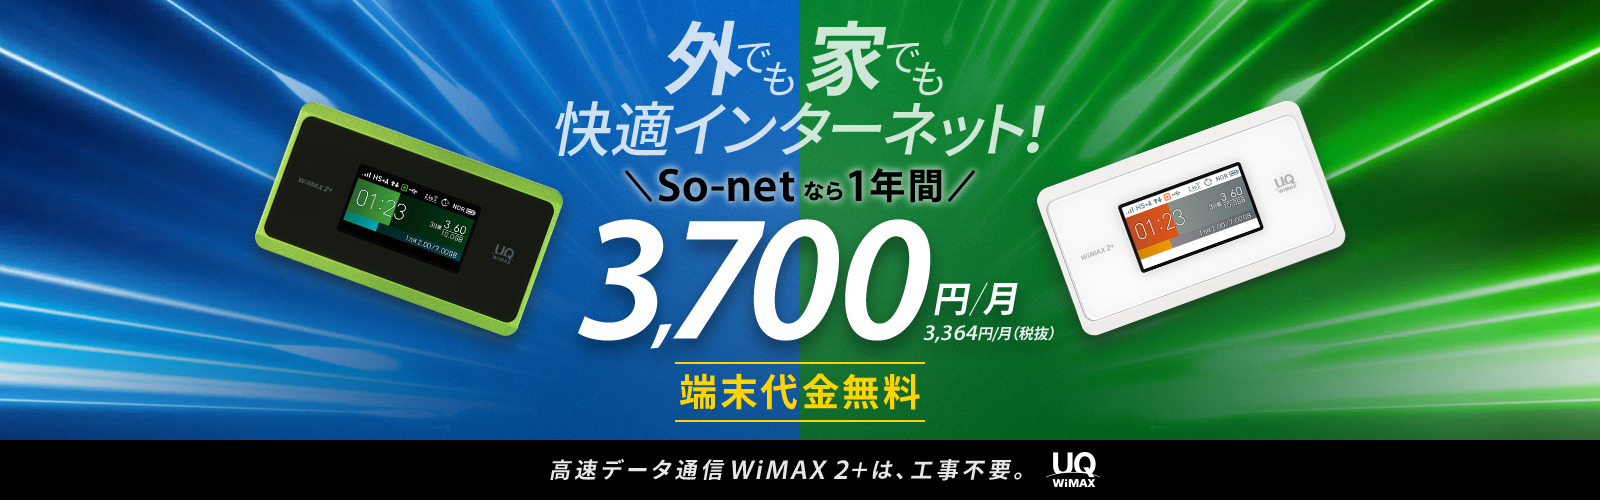 So-net WiMAX 月額割引キャンペーン「月額3,700円~」